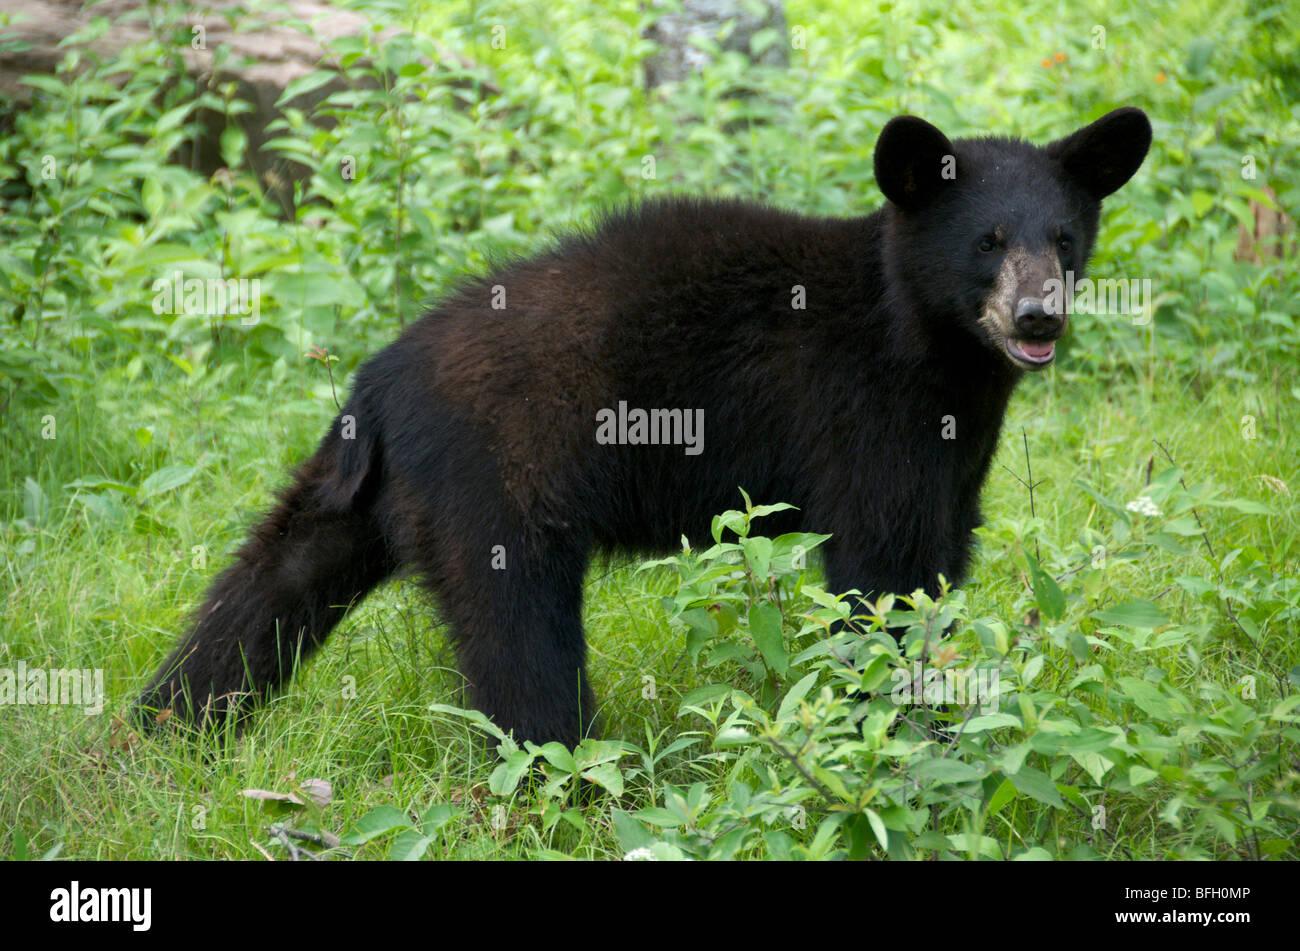 A wild male Black Bear (Ursus americanus) in Sleeping Giant Provincial Park, Ontario, Canada - Stock Image